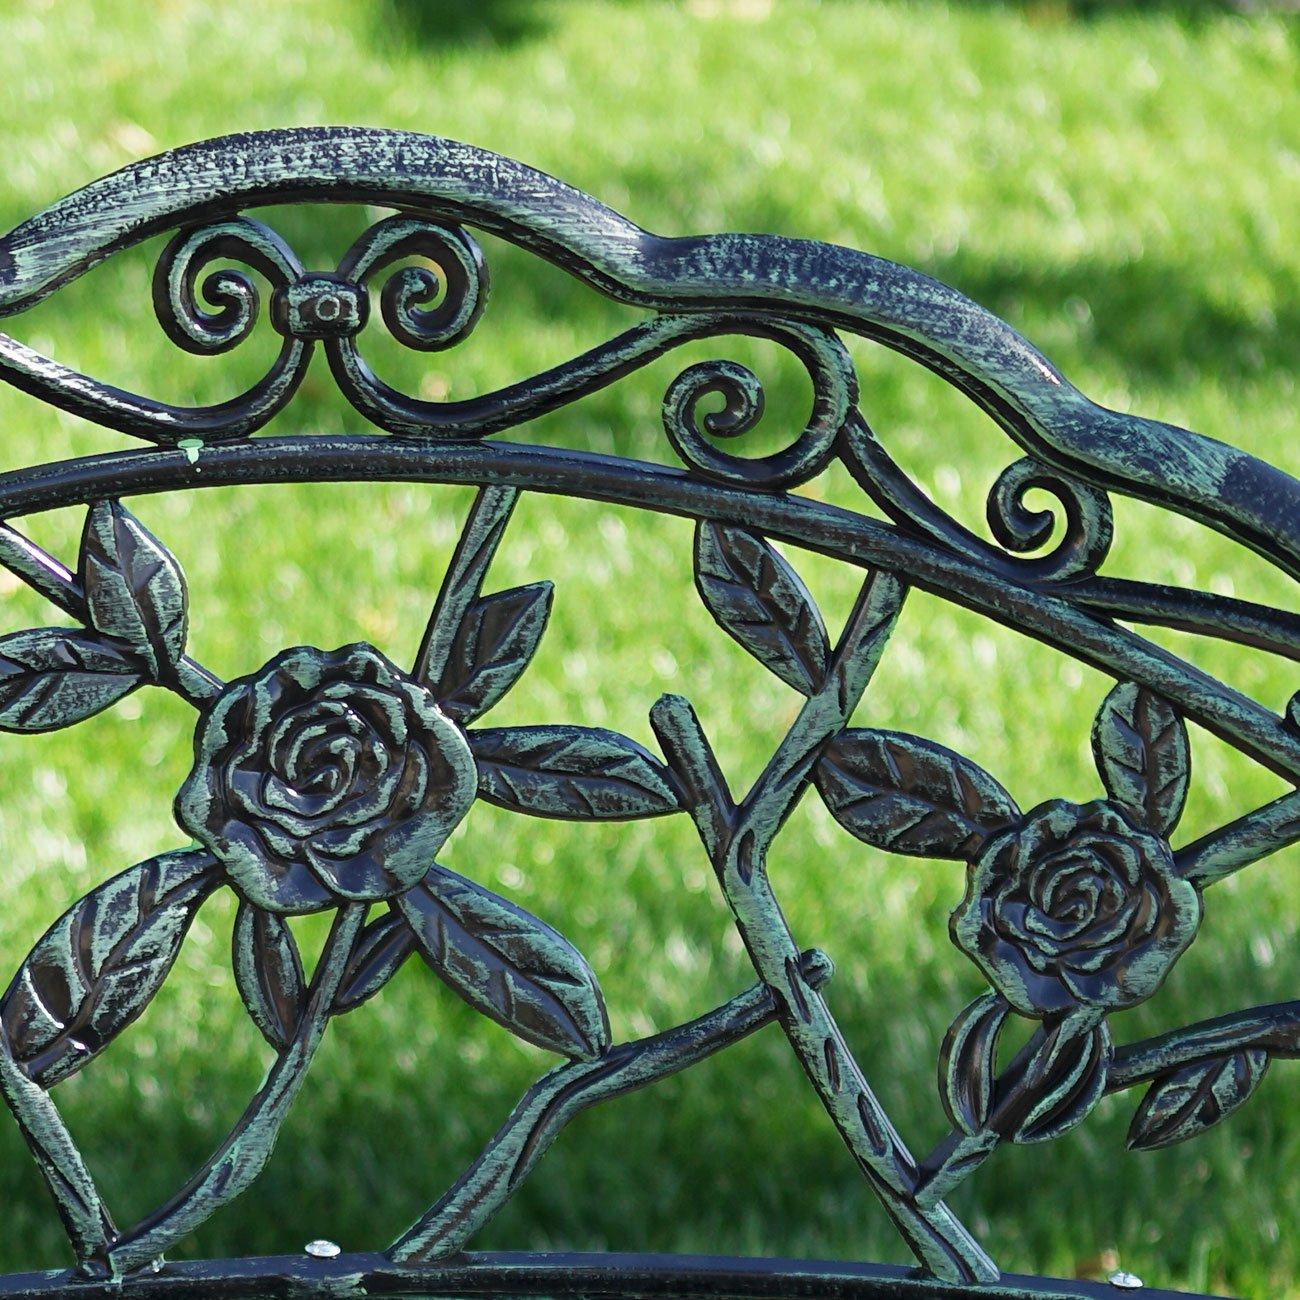 Belleze Cast Iron Antique Rose Style Design Outdoor Patio Garden Park Bench, Green 1